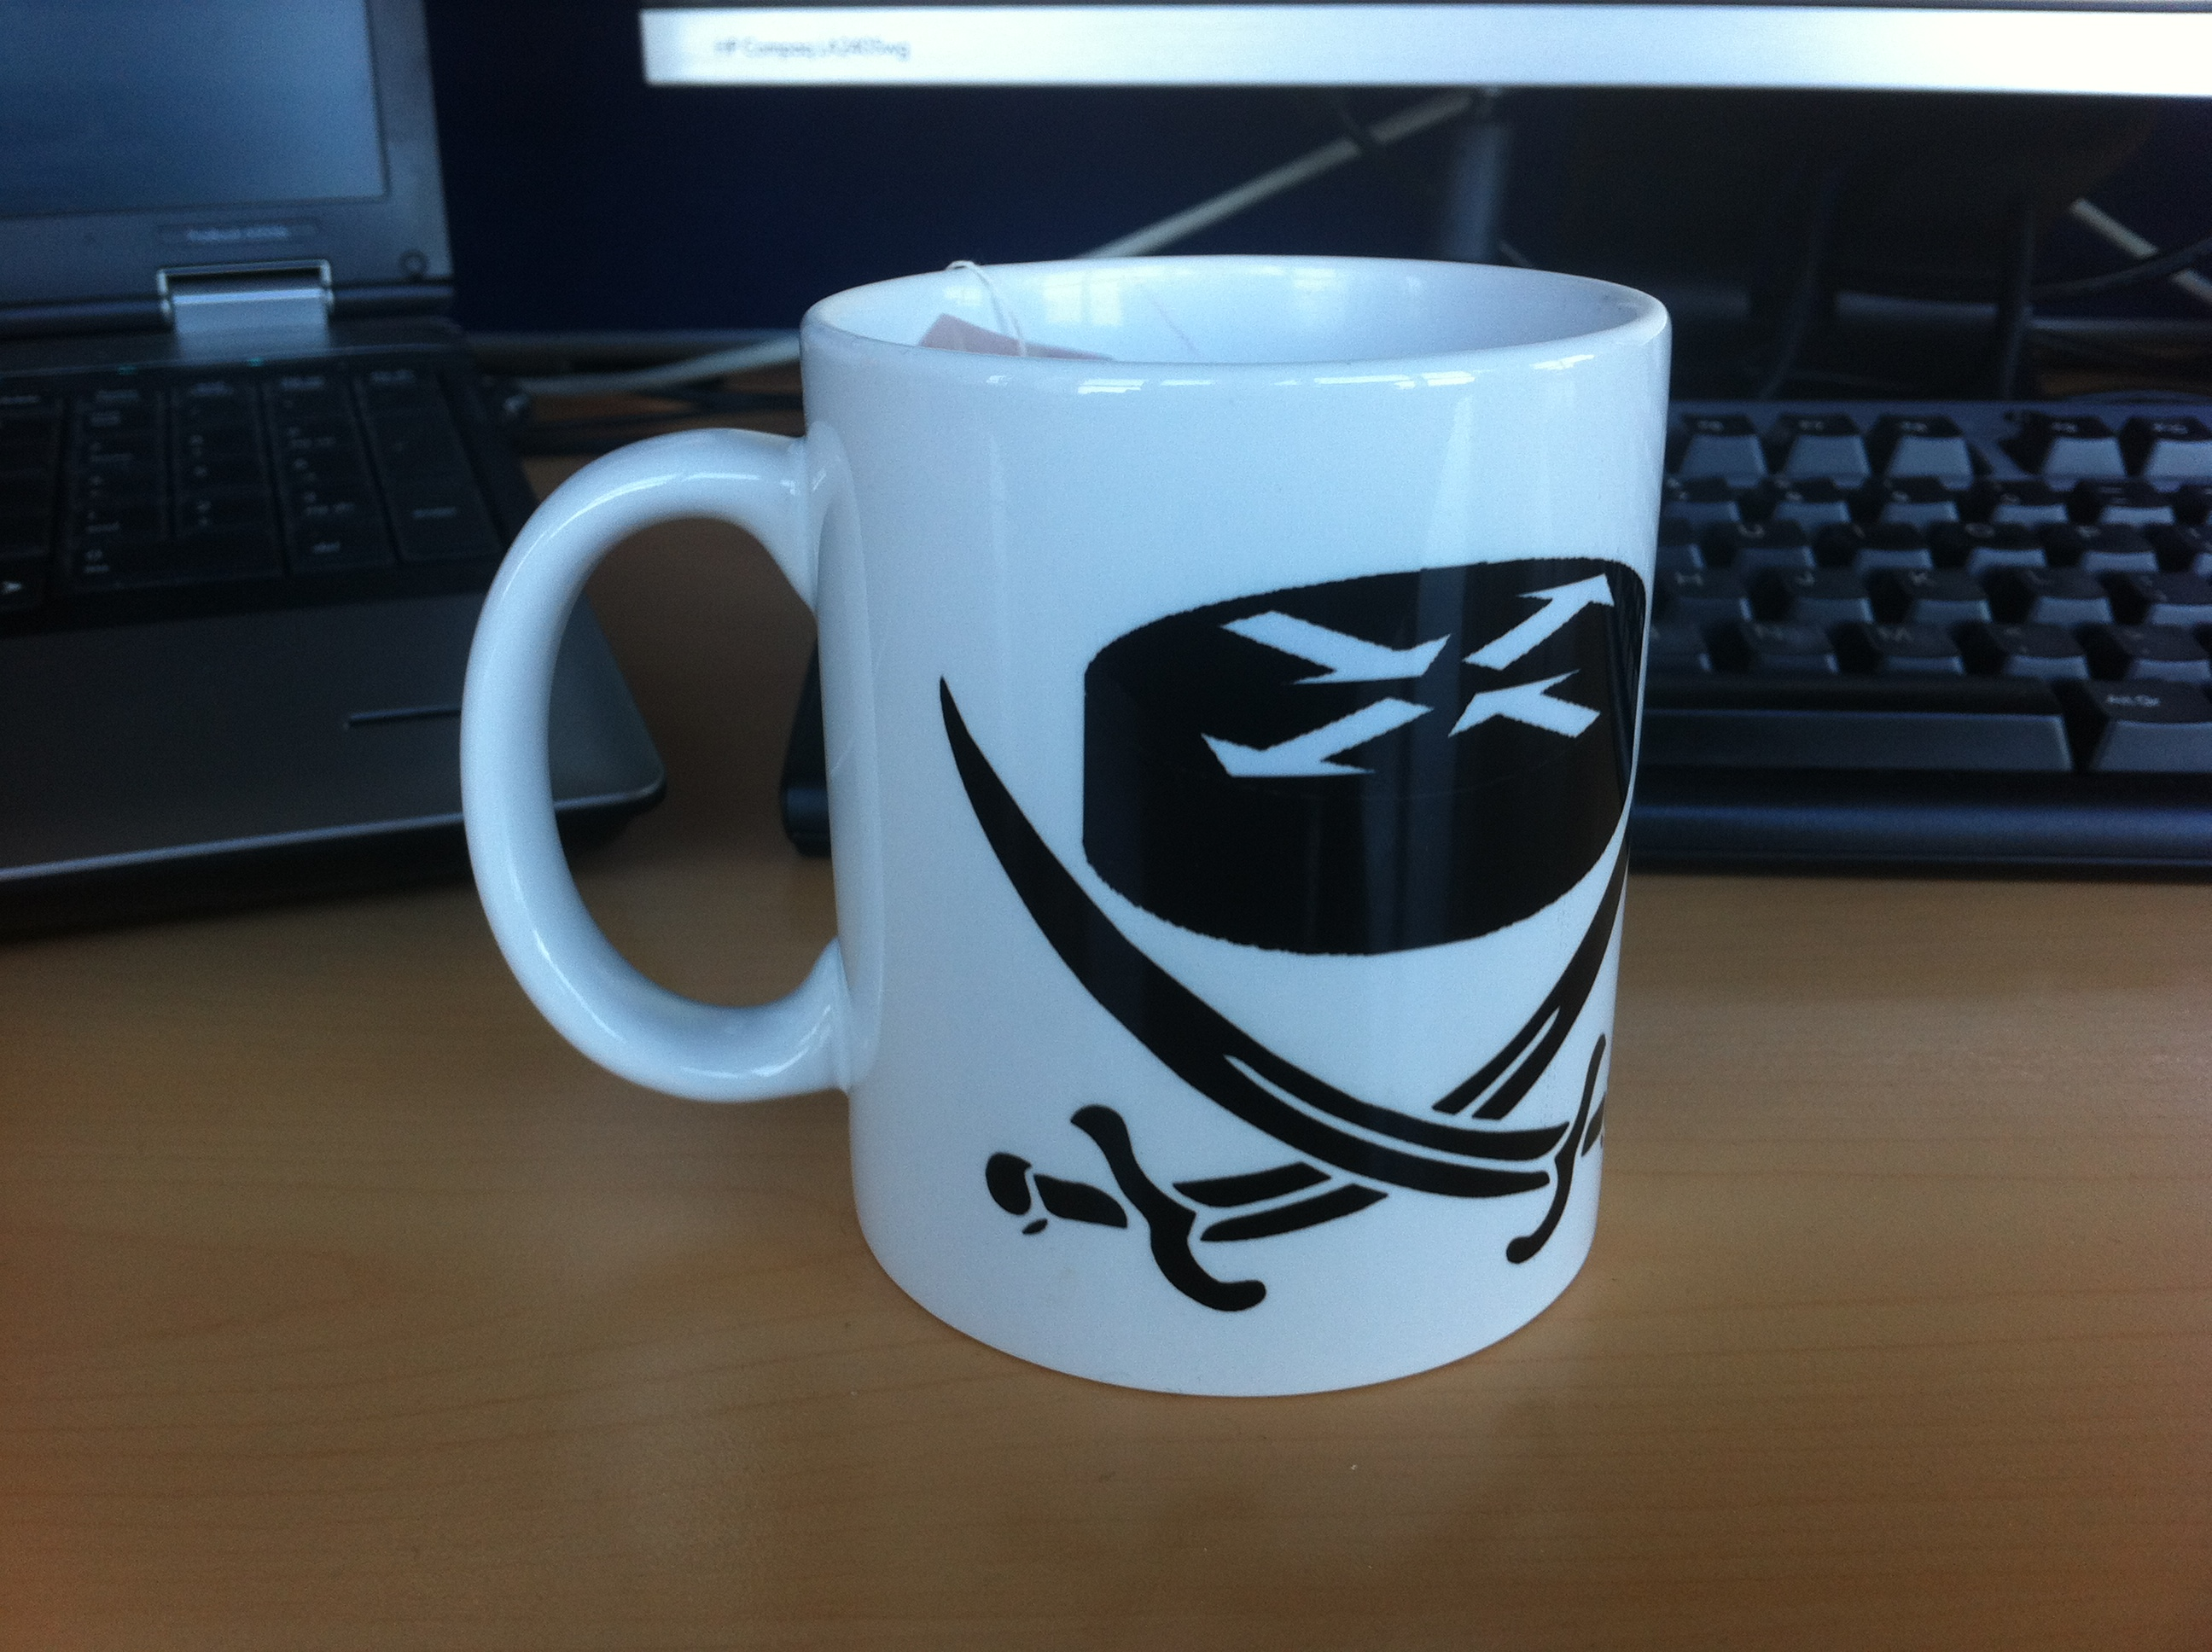 NetworkGeekStuff CUP #1